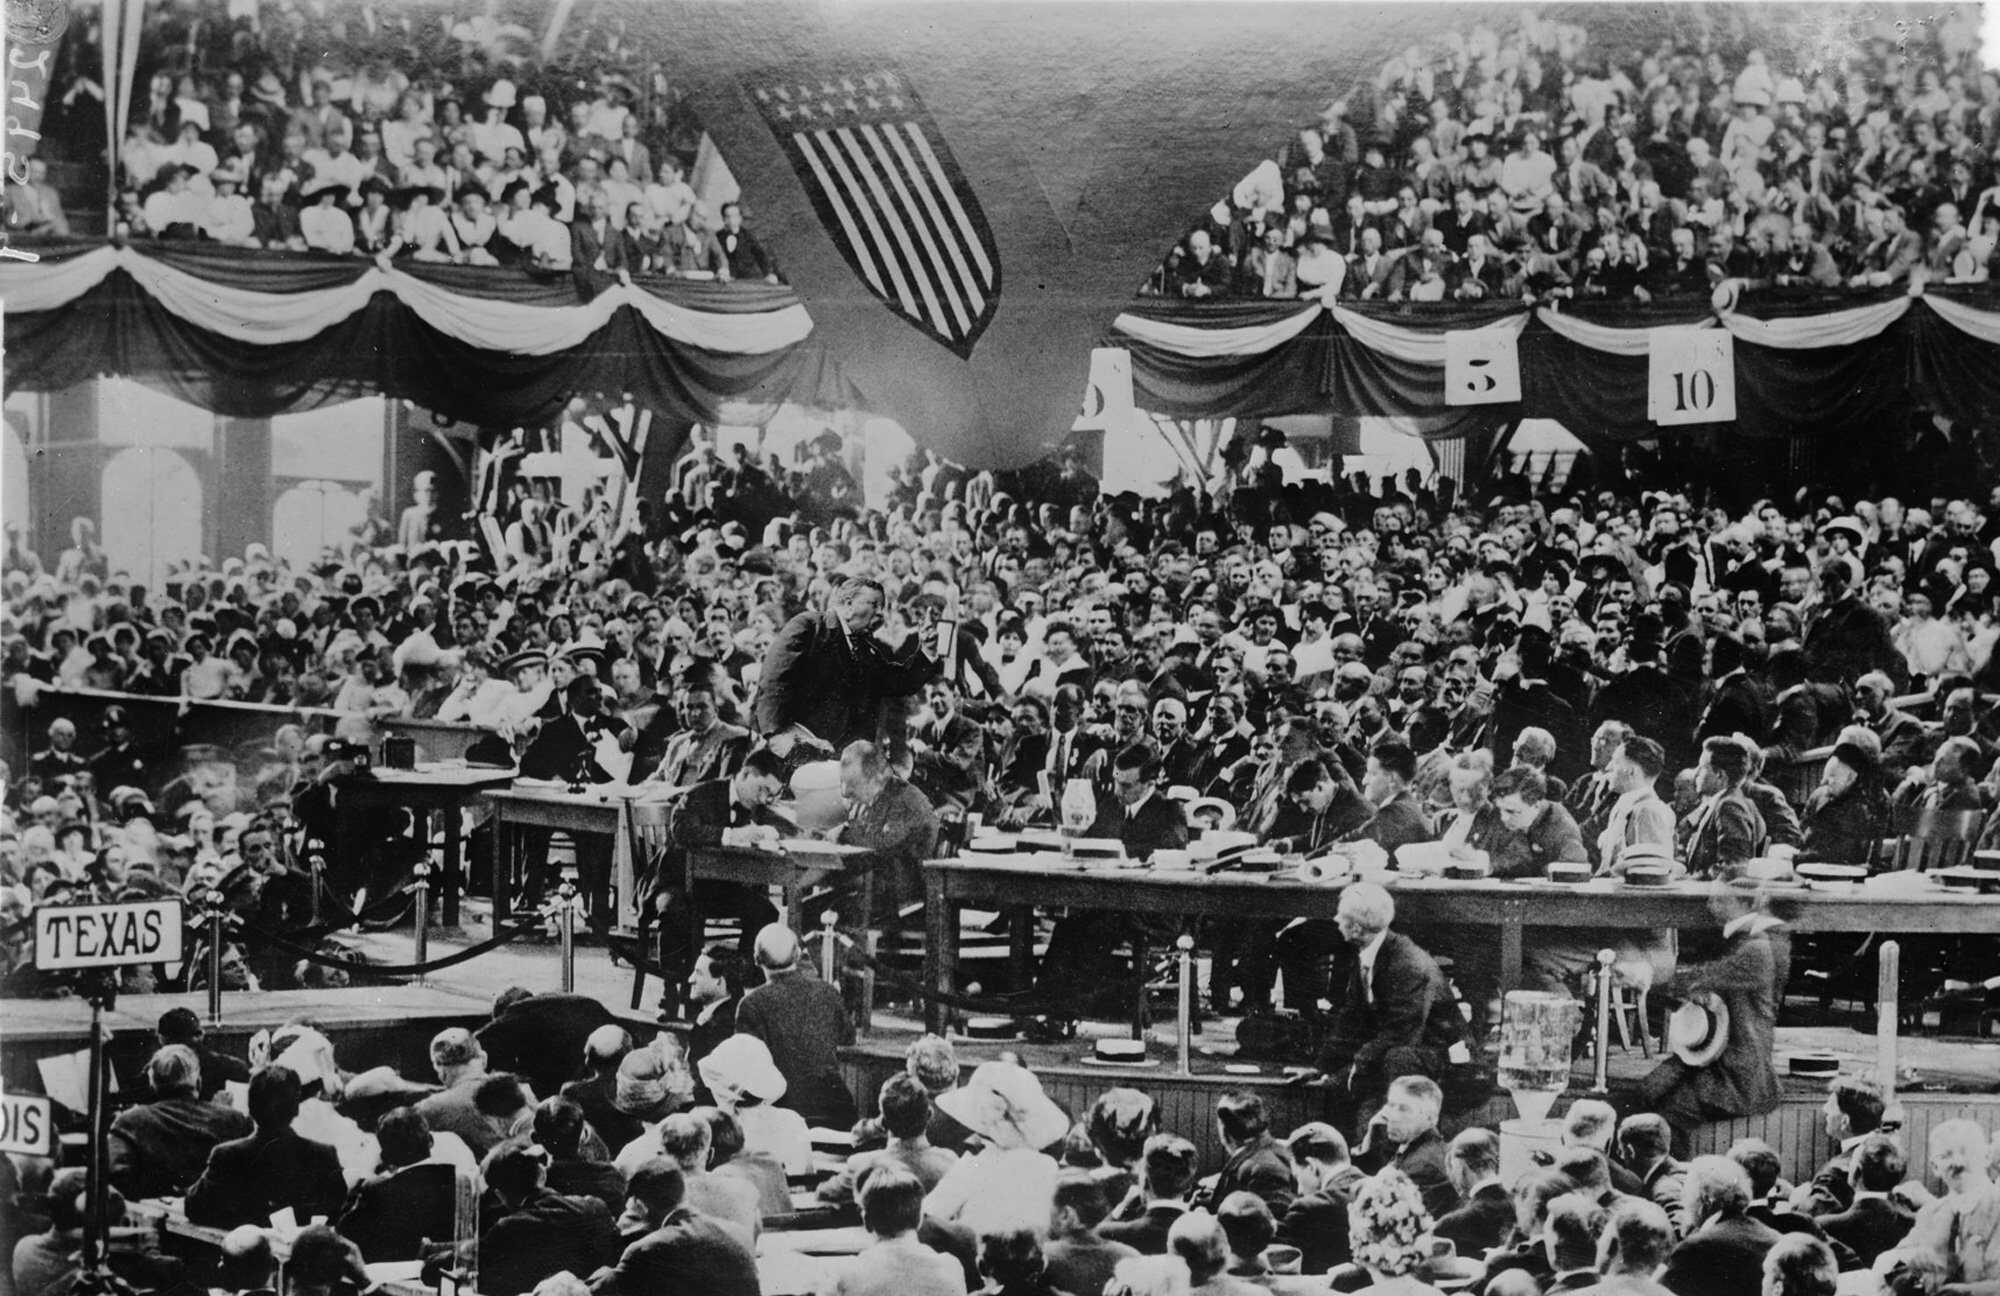 TR-Presidential-Politics-Roosevelt-speaking-in-convention-hall-hicago-August-1912.jpg